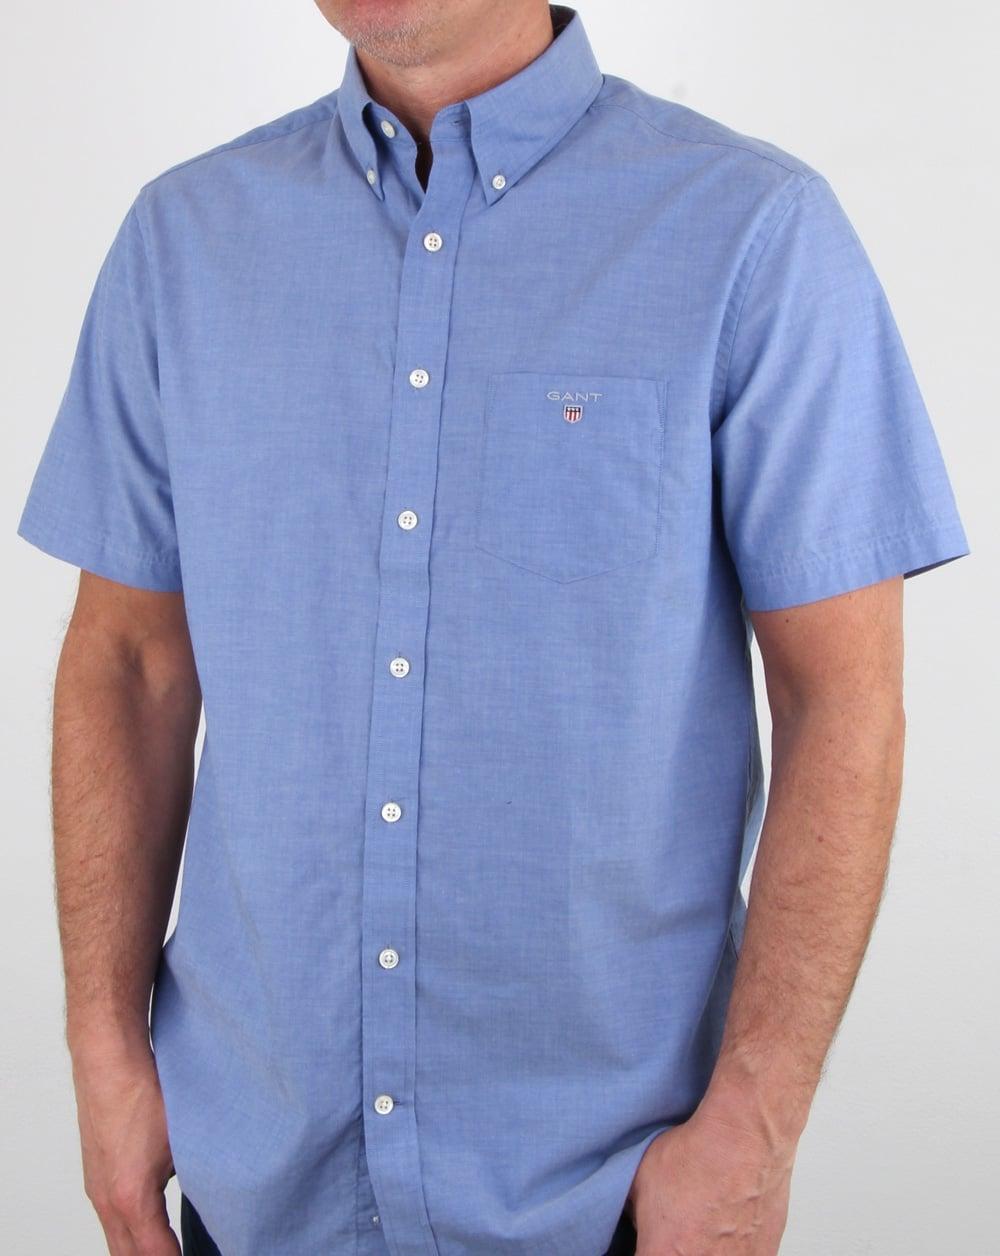 fee916d136b Gant Broadcloth Short Sleeve Shirt Yale Blue | 80s casual classics